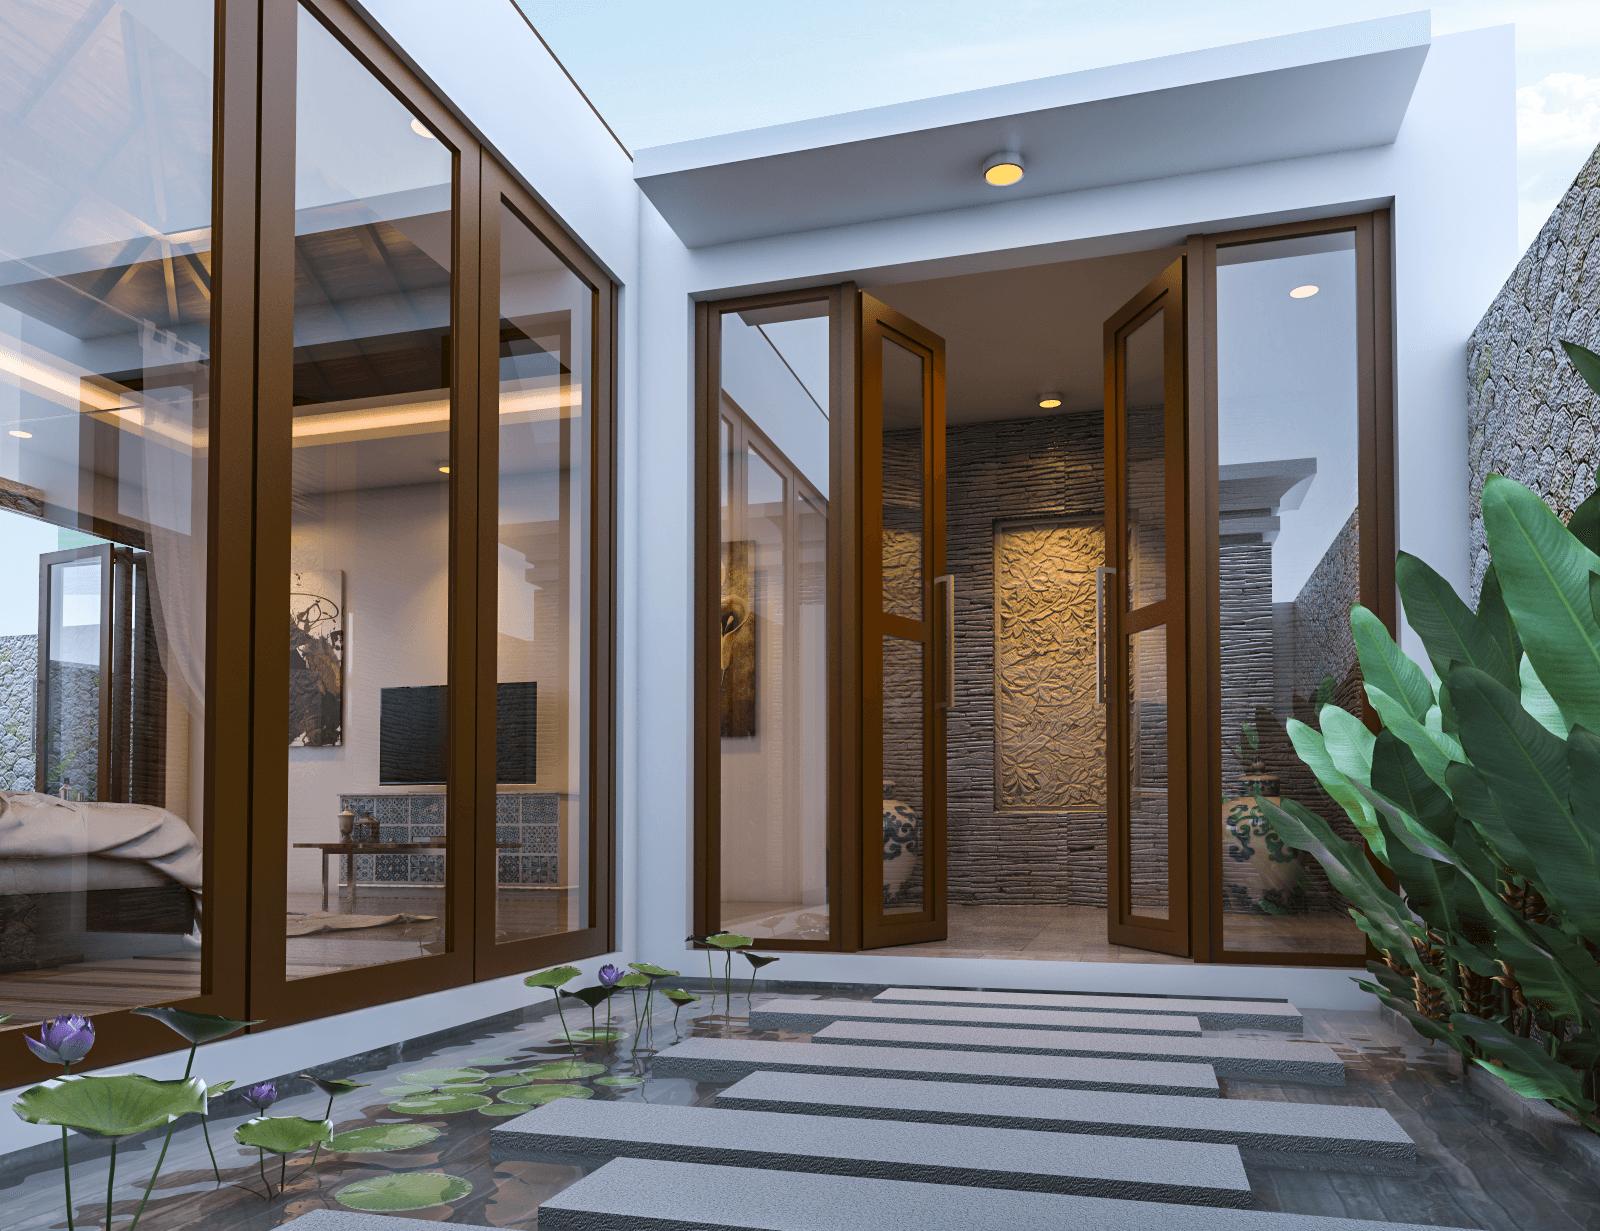 Imaji Architect Villa Bougainville Seminyak Seminyak Imajiarchitect-Villa Bougainville2 Minimalis  26997